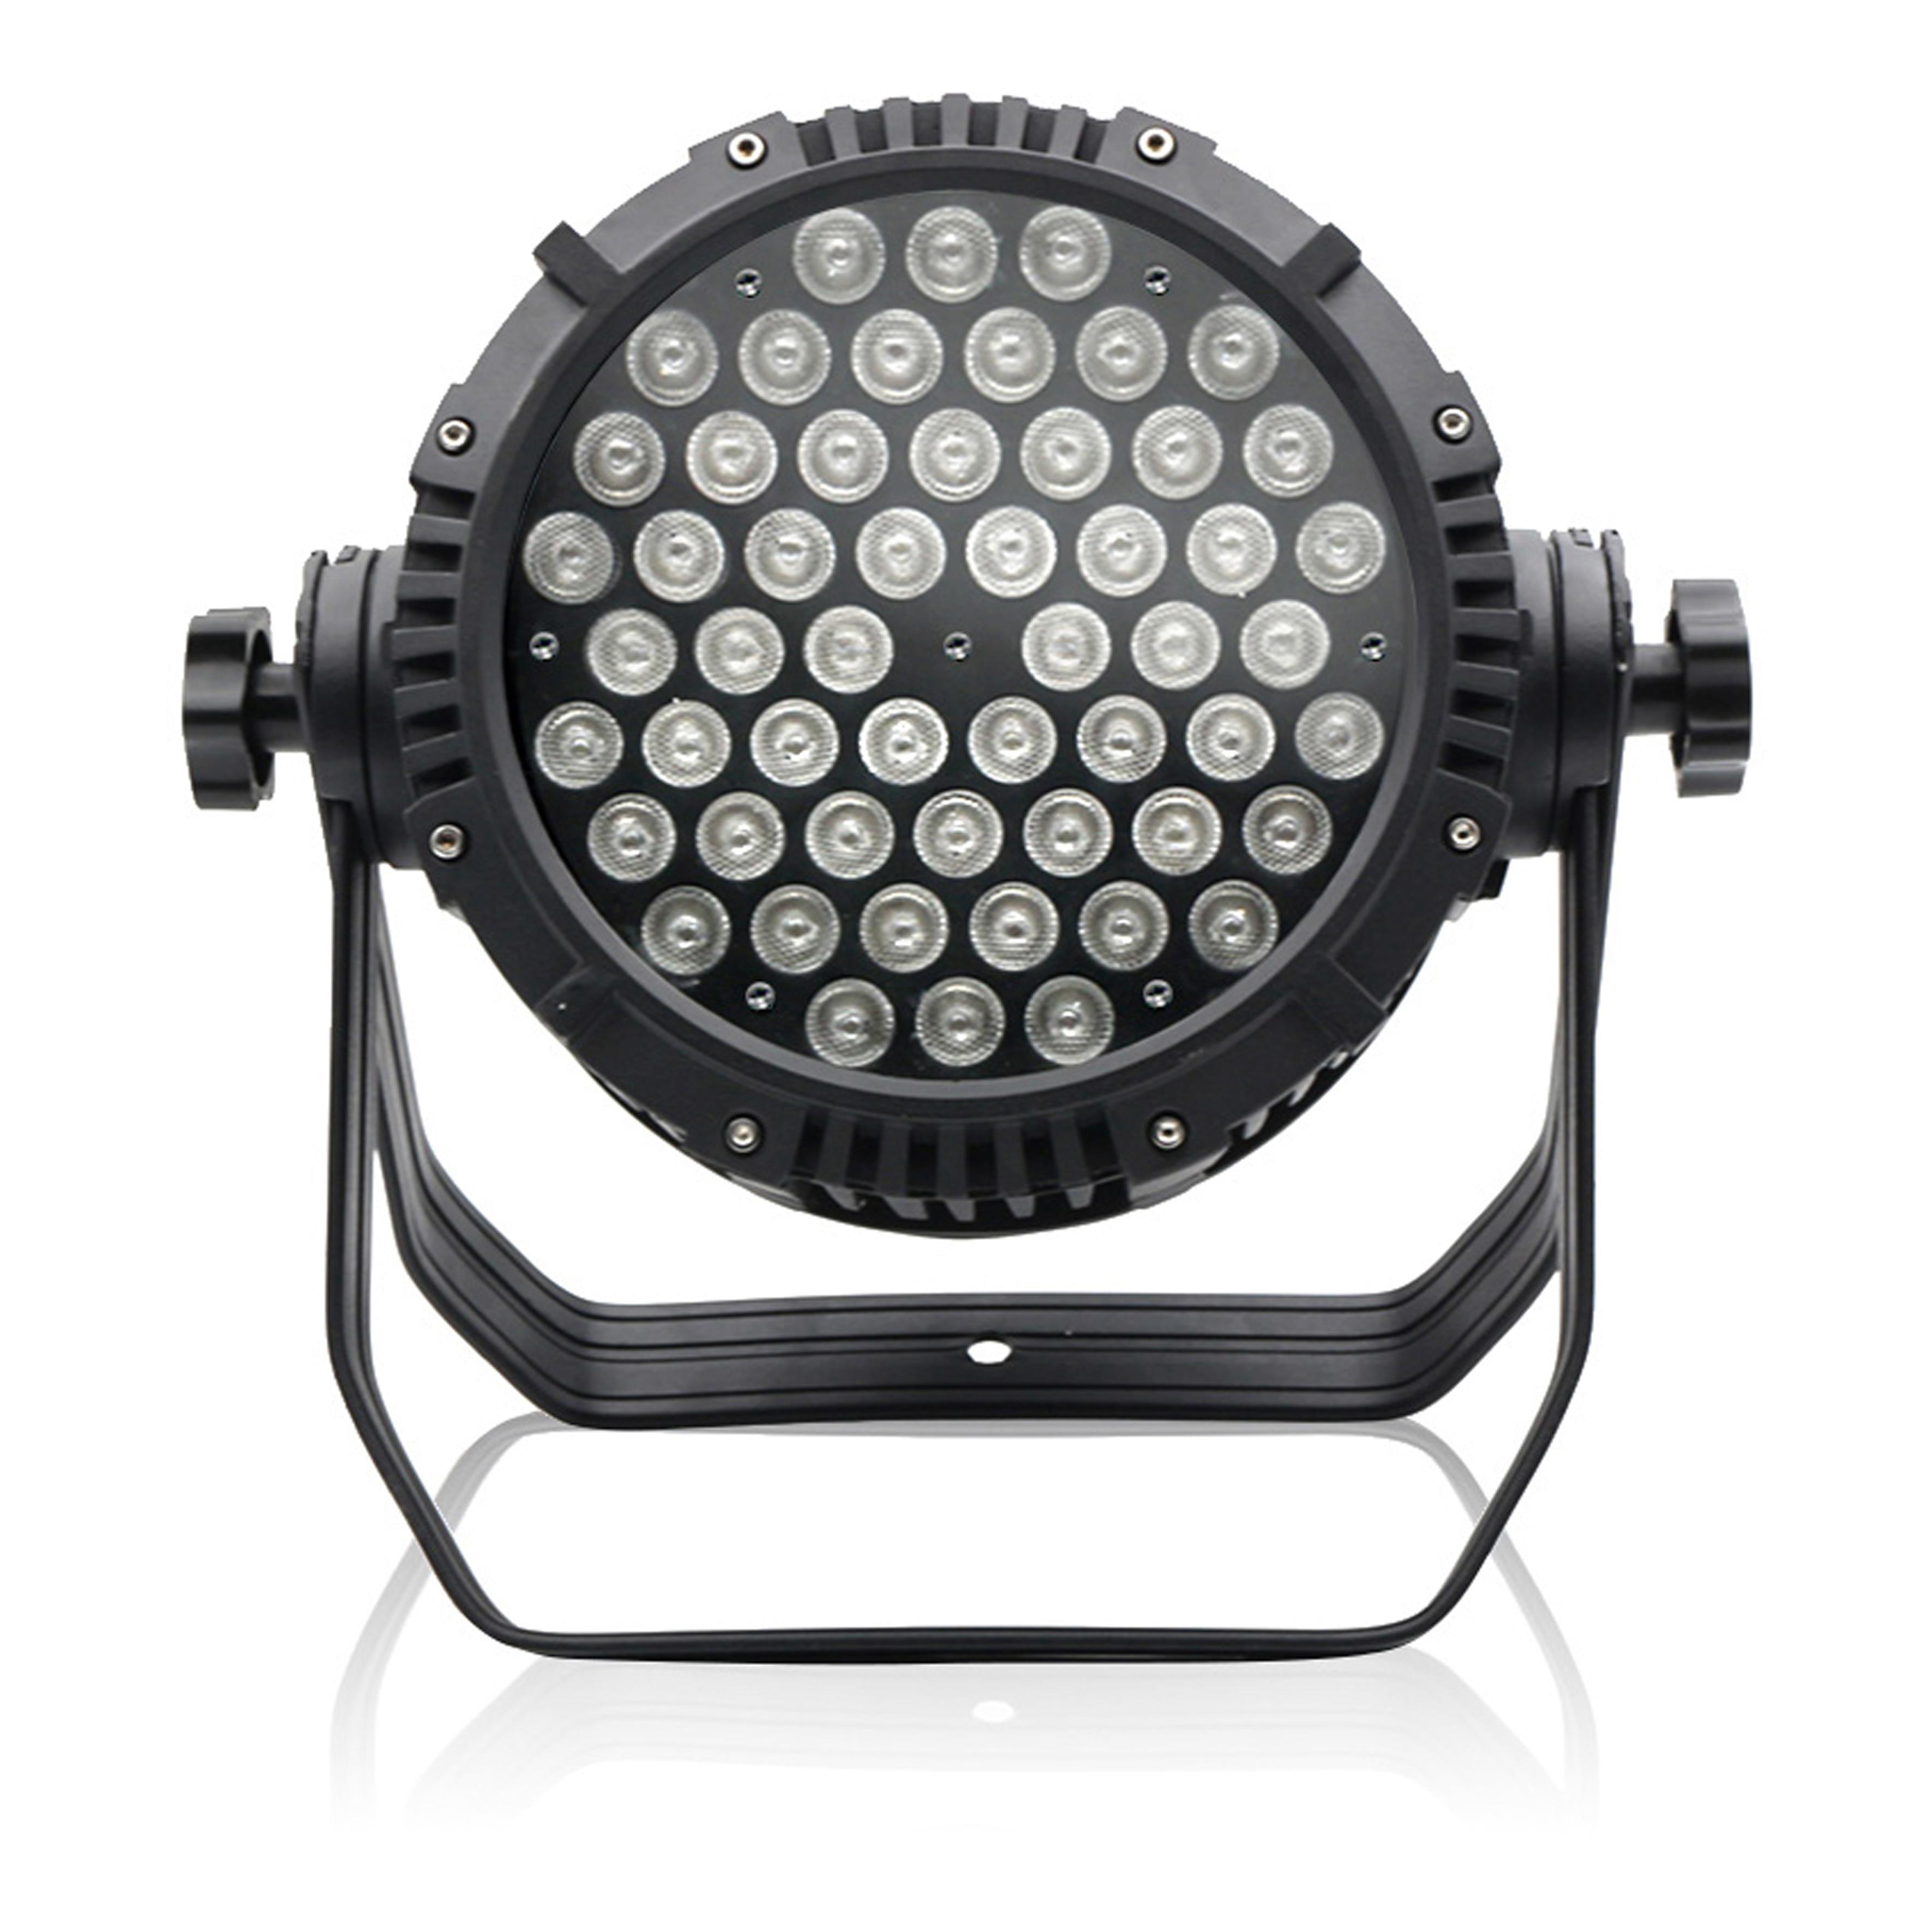 (4PCS/Lot) IP68 Waterproof 18W 24W 36W 54W DMX LED Stage Light DMX512 RGB Floodlight Flood Light Bridgelux Chip Wall Washer Lamp